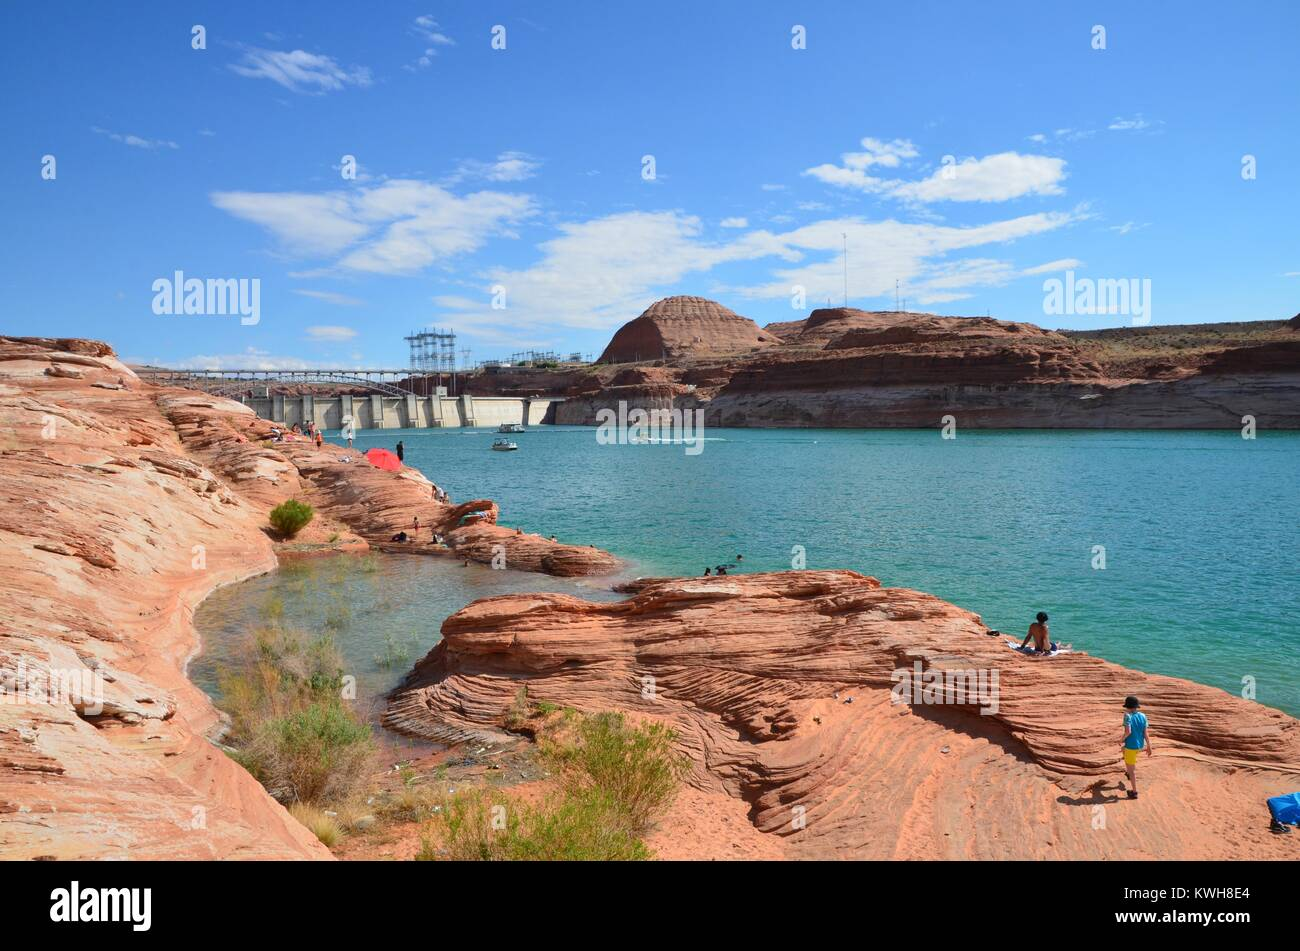 people enjoying the water at lake powell on a sunny arizona day Stock Photo